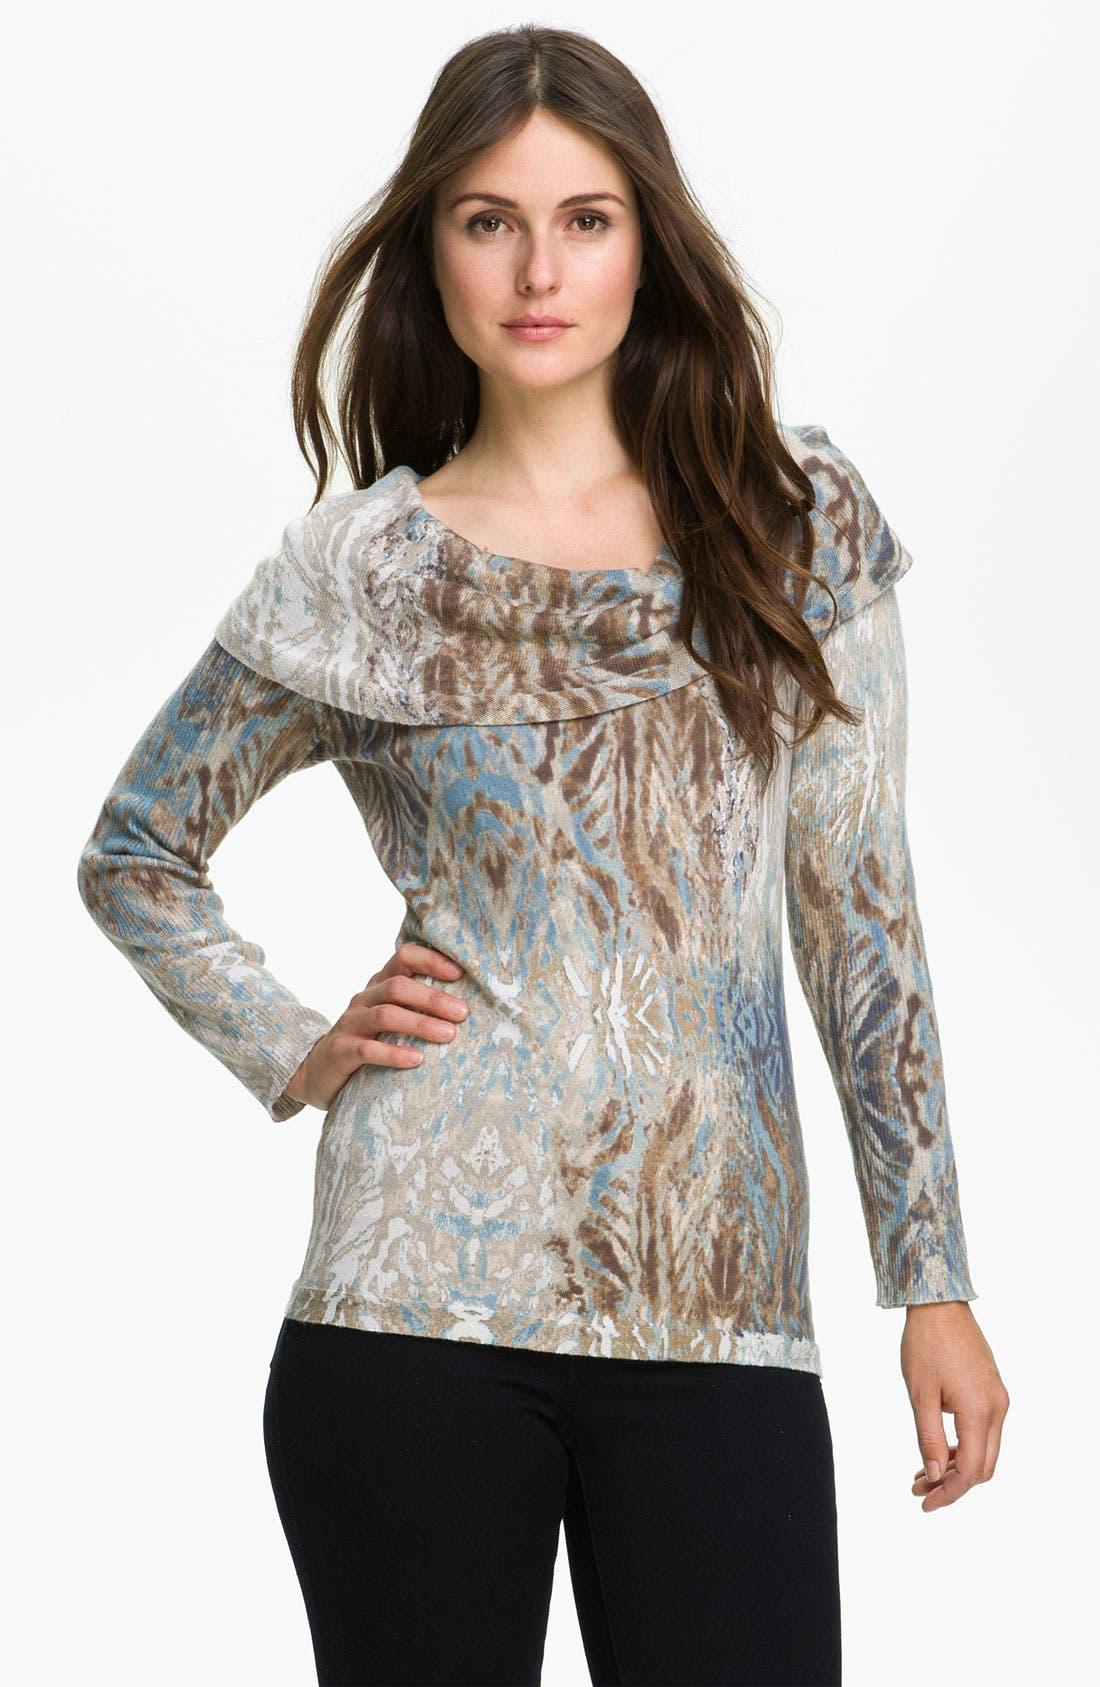 Alternate Image 1 Selected - Nic + Zoe 'Polaris' Print Sweater